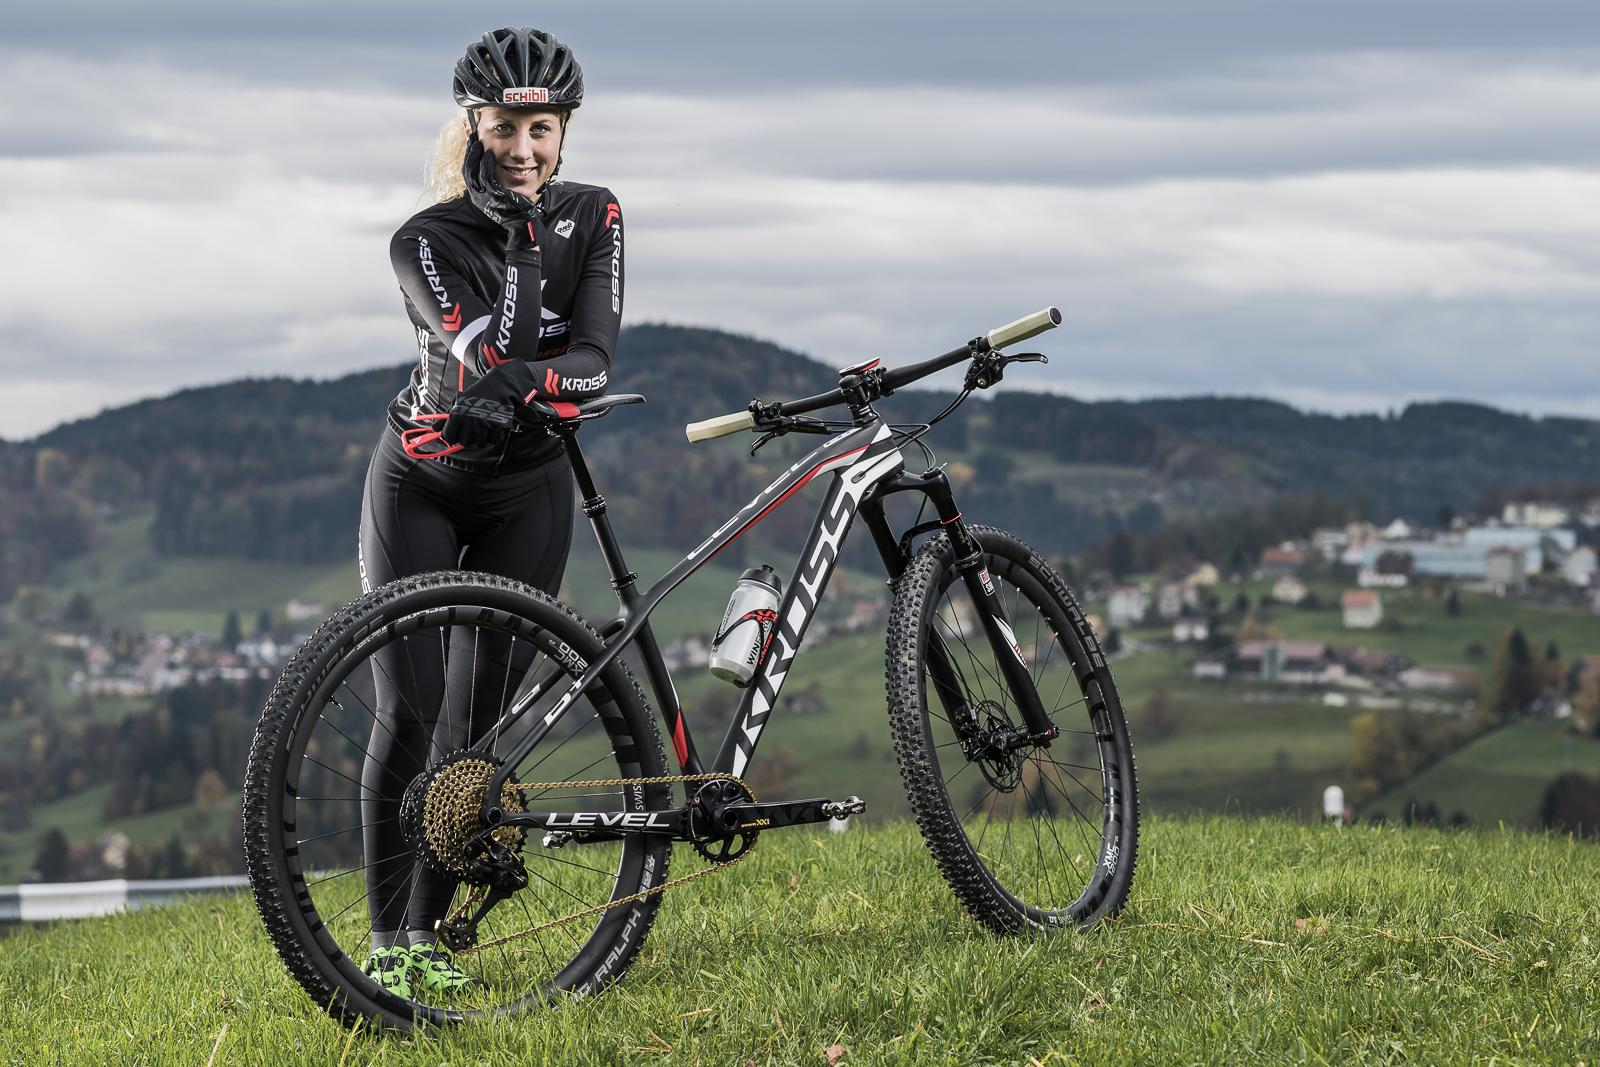 jolanda-neff-kross-racing-team-1